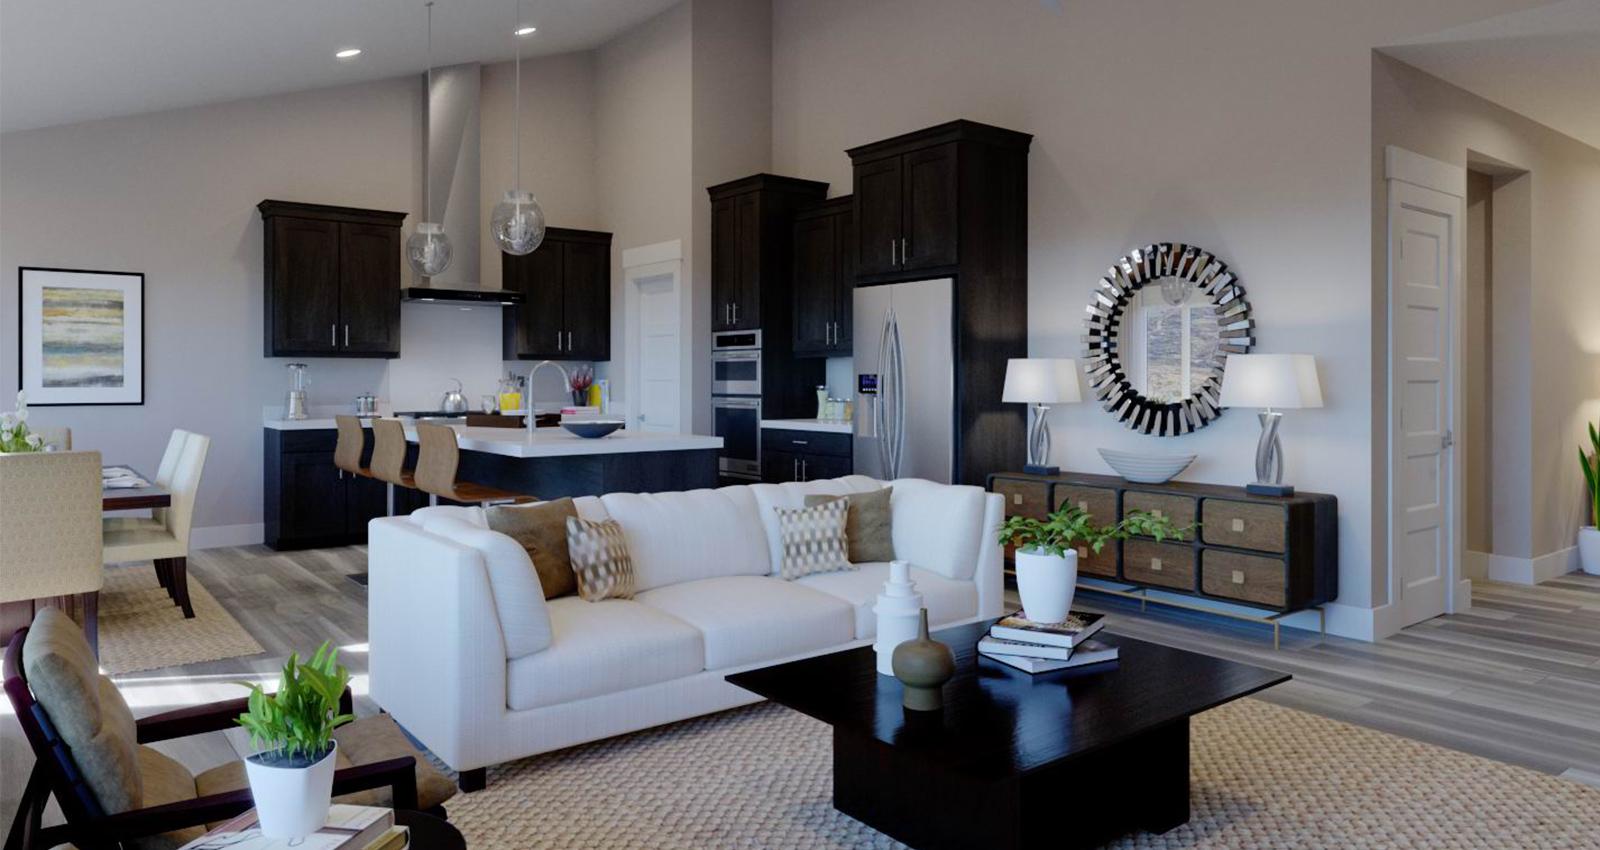 open floorplan kitchen and living room in gcd luxury home